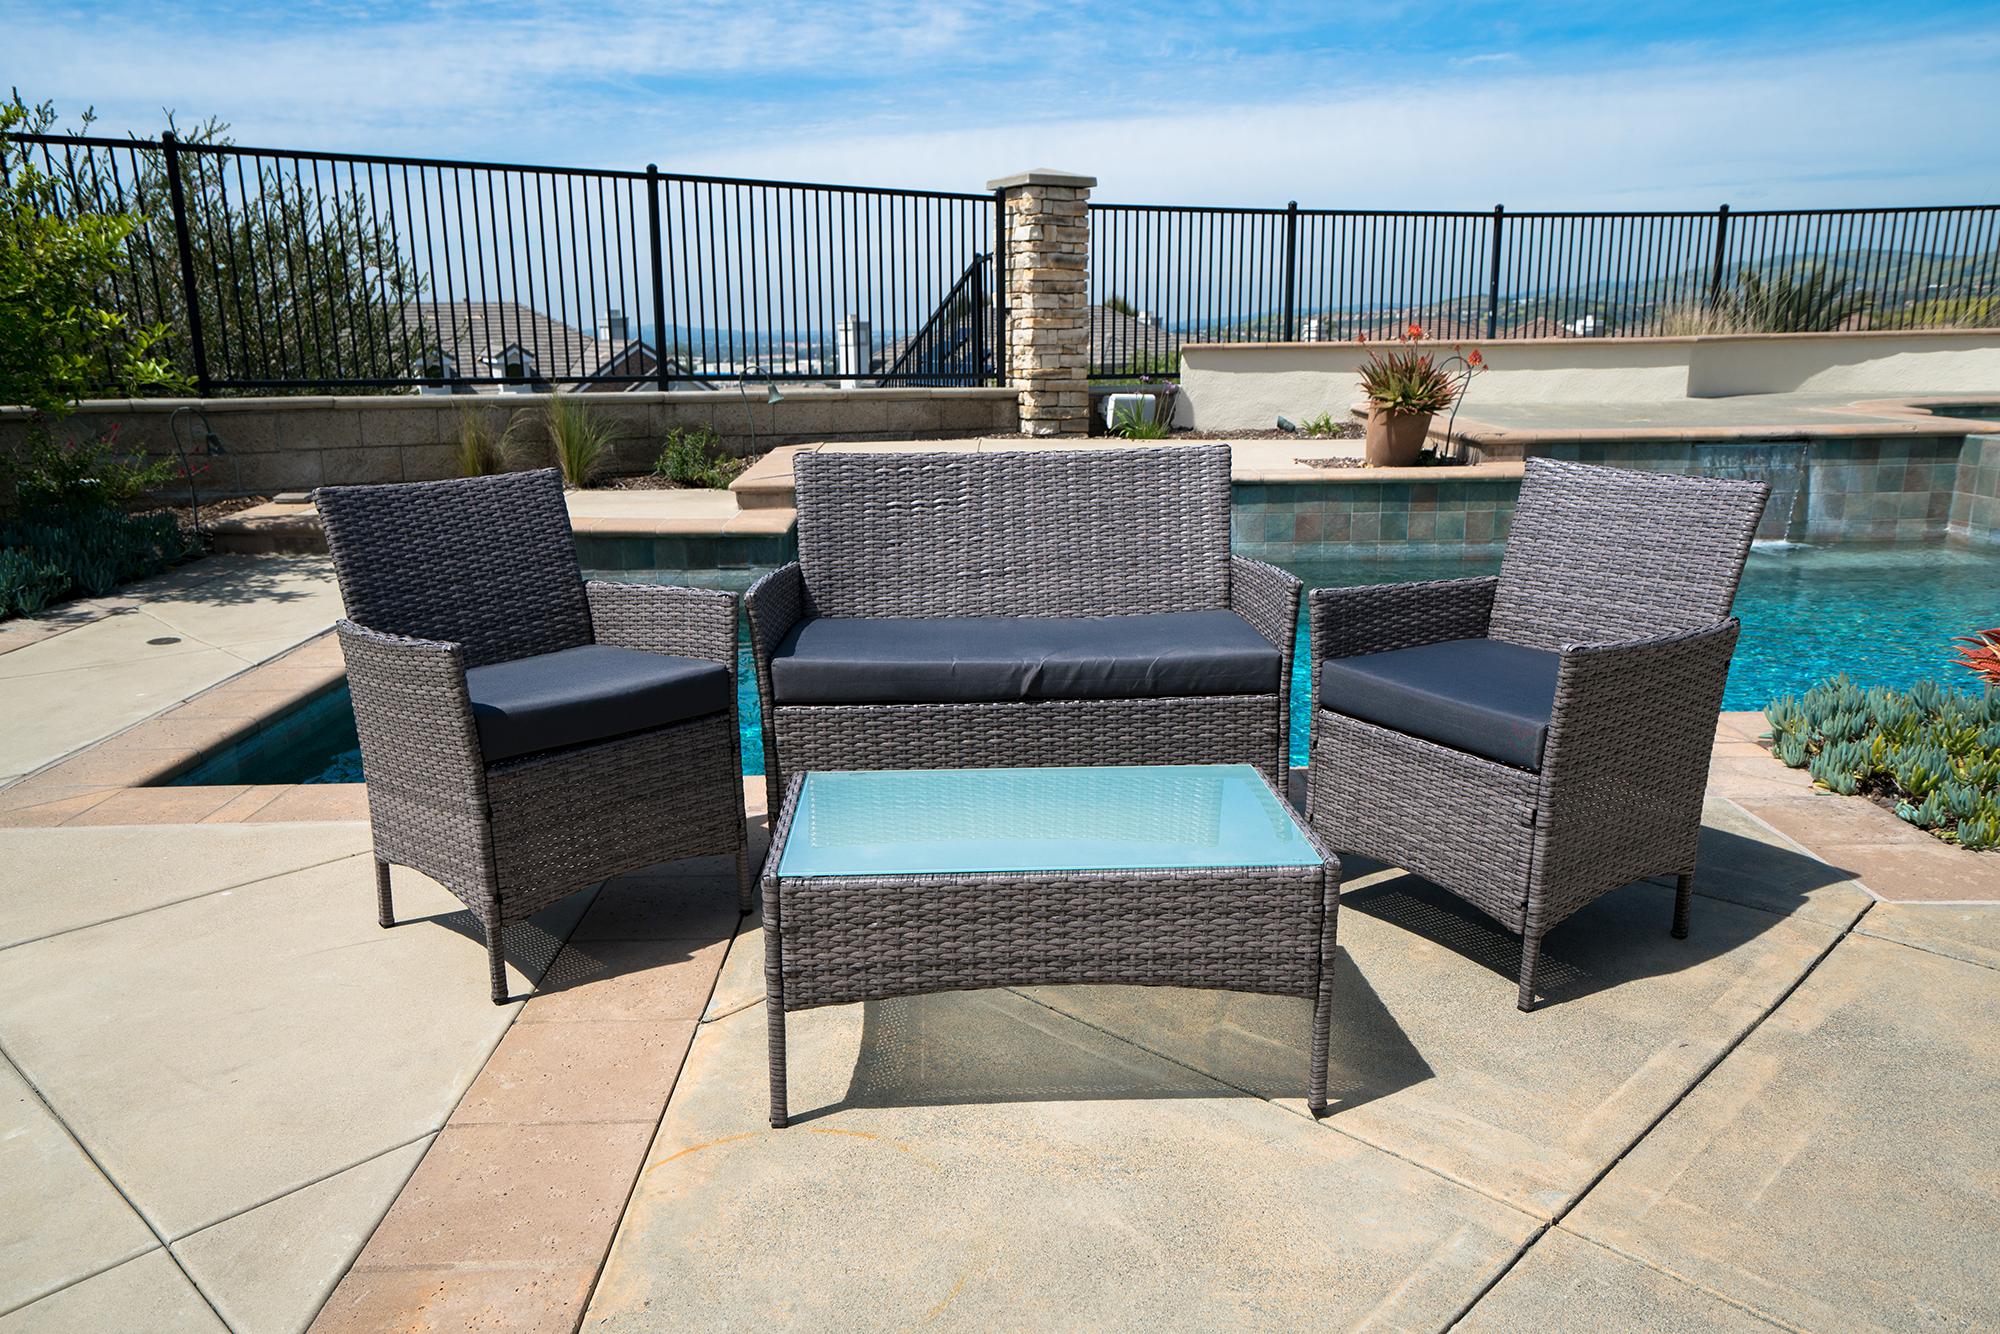 4pc Patio Furniture Set PE Wicker Cushioned Outdoor Rattan Sofa